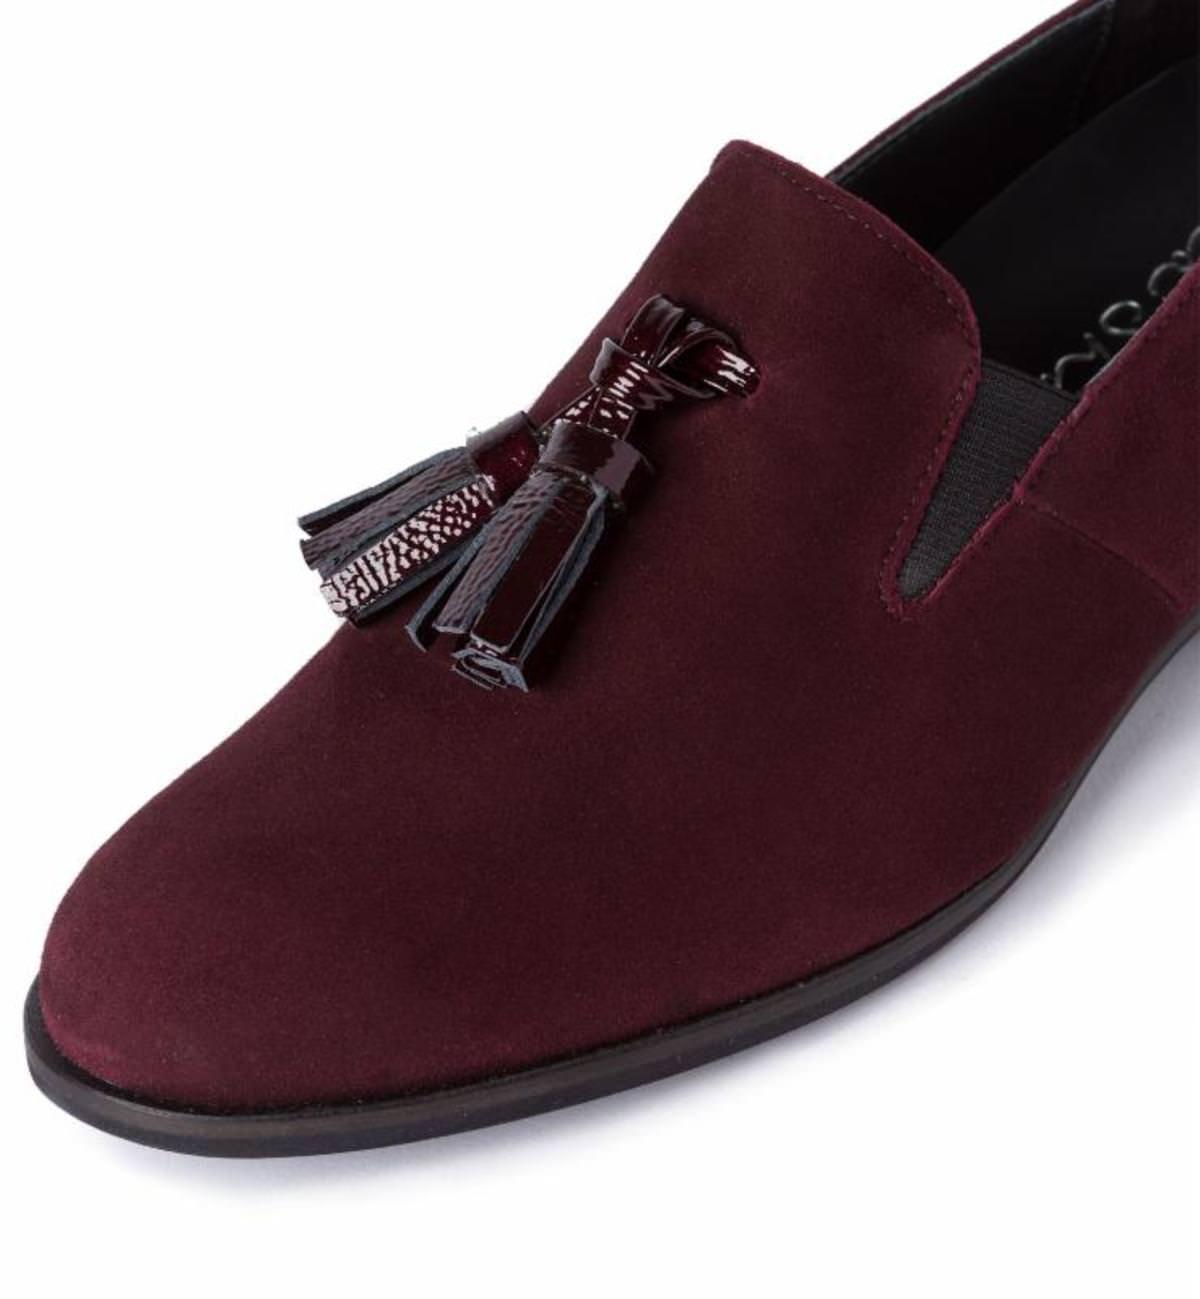 slipper mit quasten bordeaux f r hallux valgus kaufen lashoe. Black Bedroom Furniture Sets. Home Design Ideas